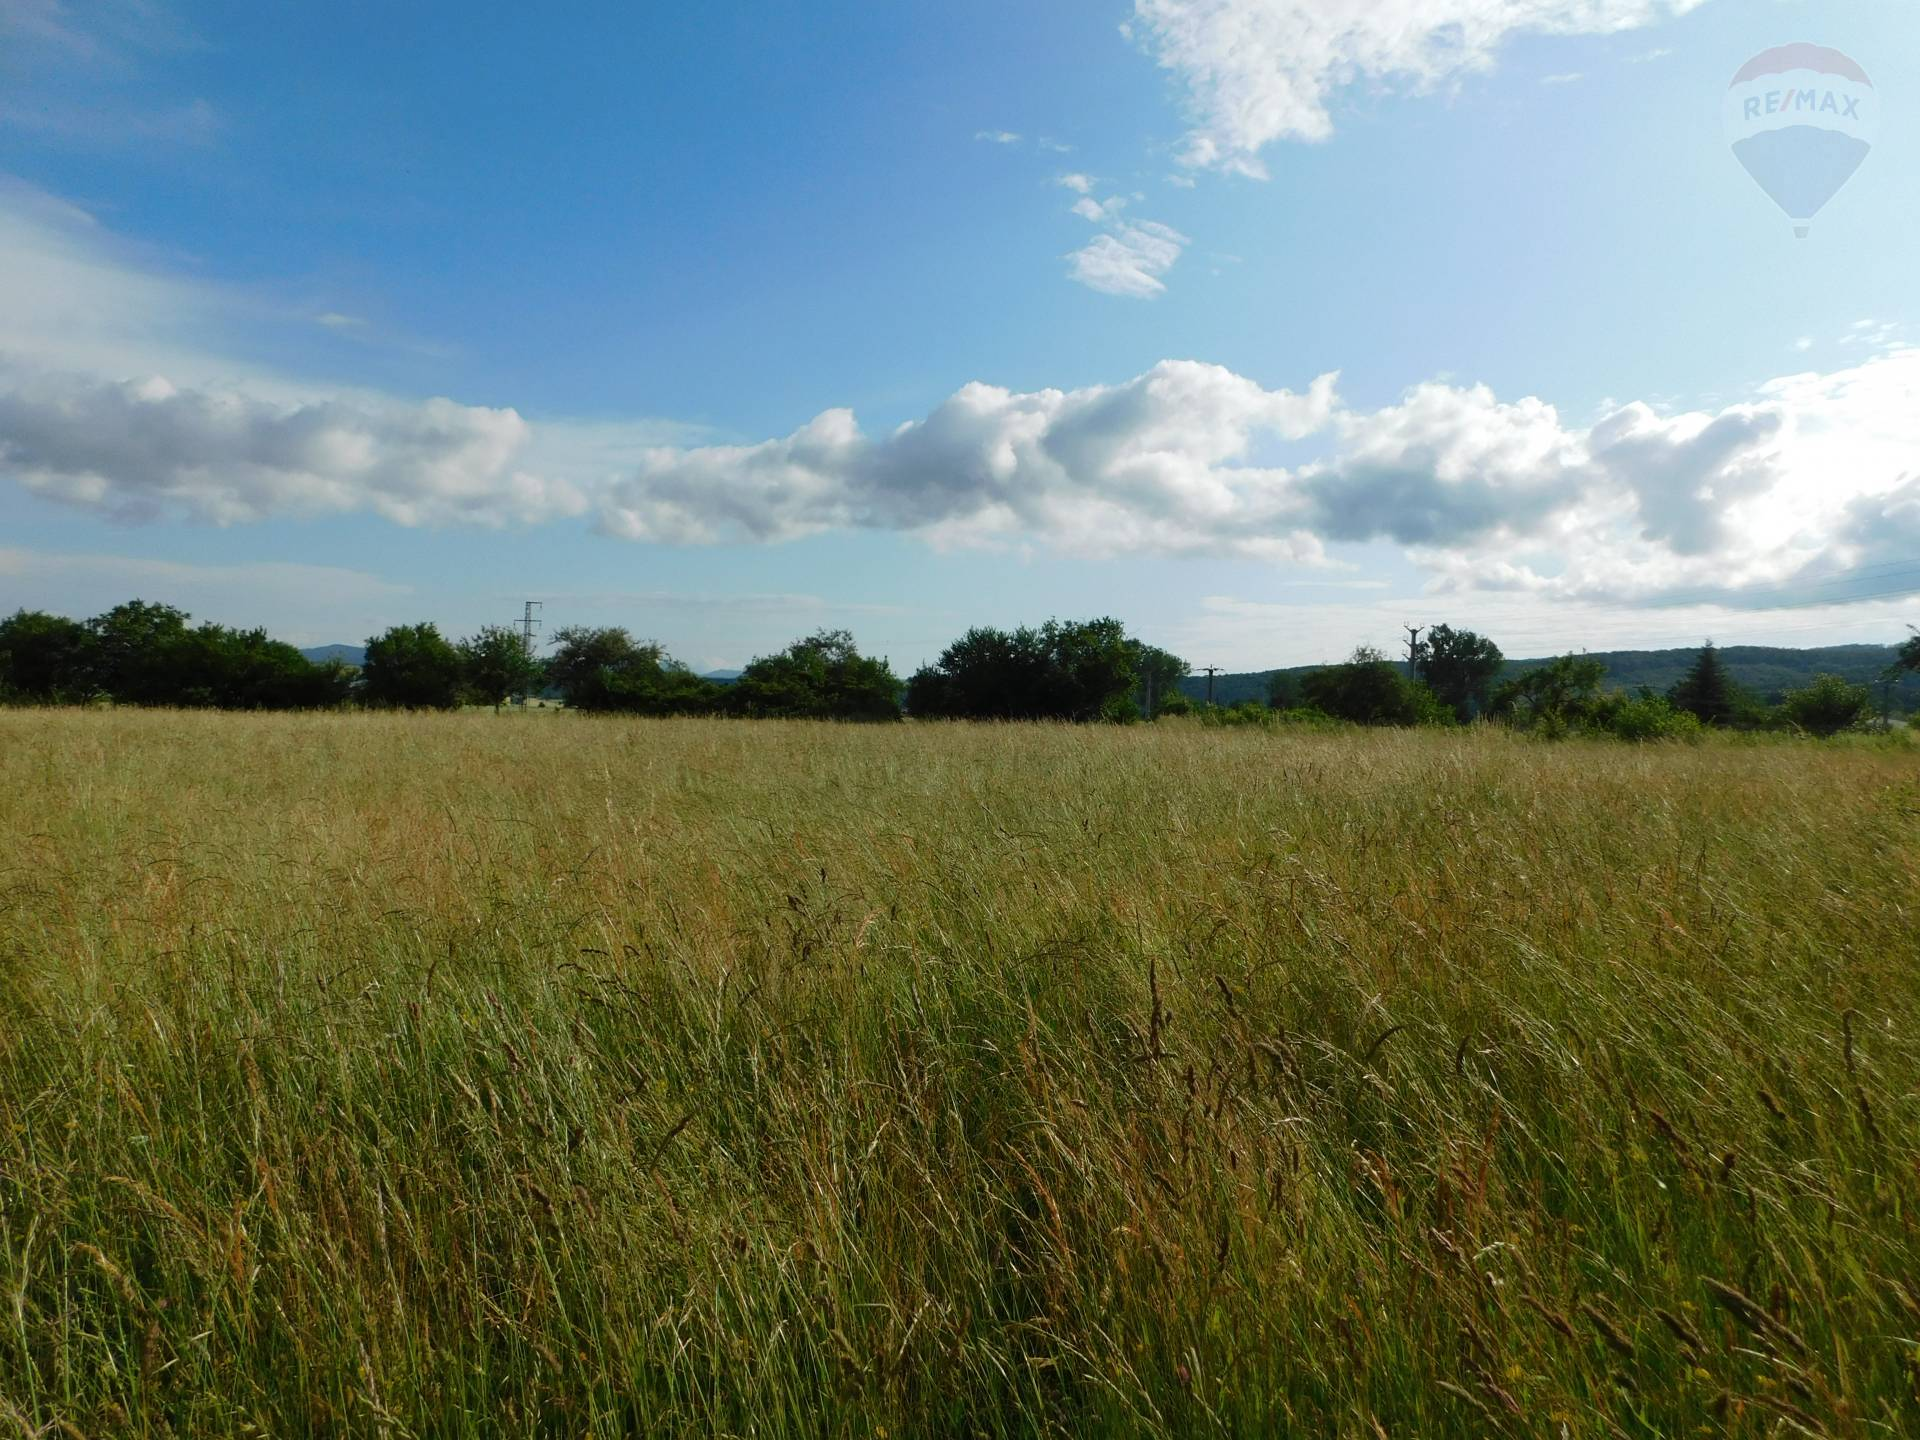 Predaj pozemku pri Banskej Bystrici - Badín